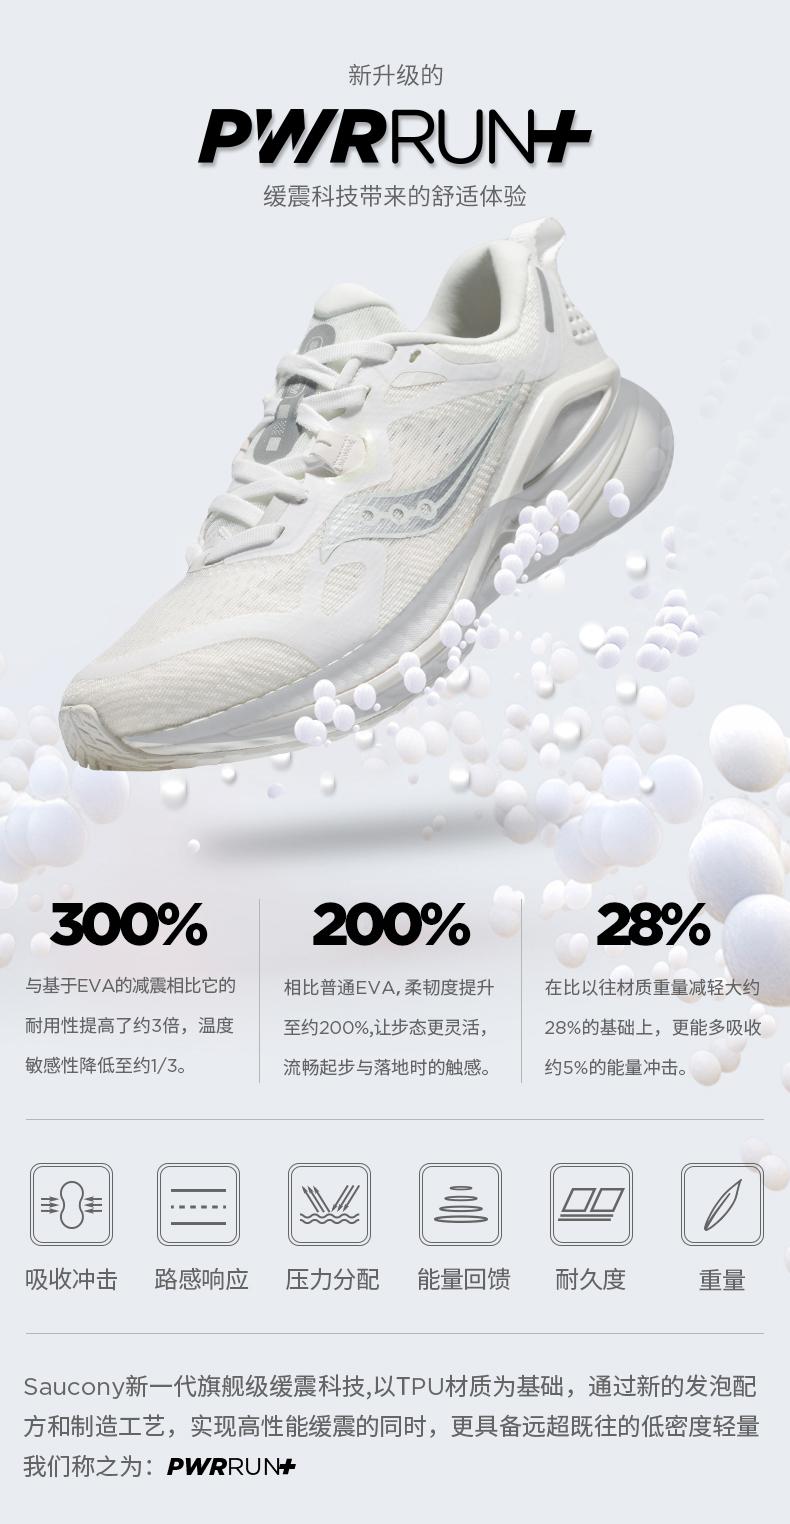 Saucony索康尼 INFERNO火鸟 女子缓震减震训练跑步鞋跑鞋女S18150